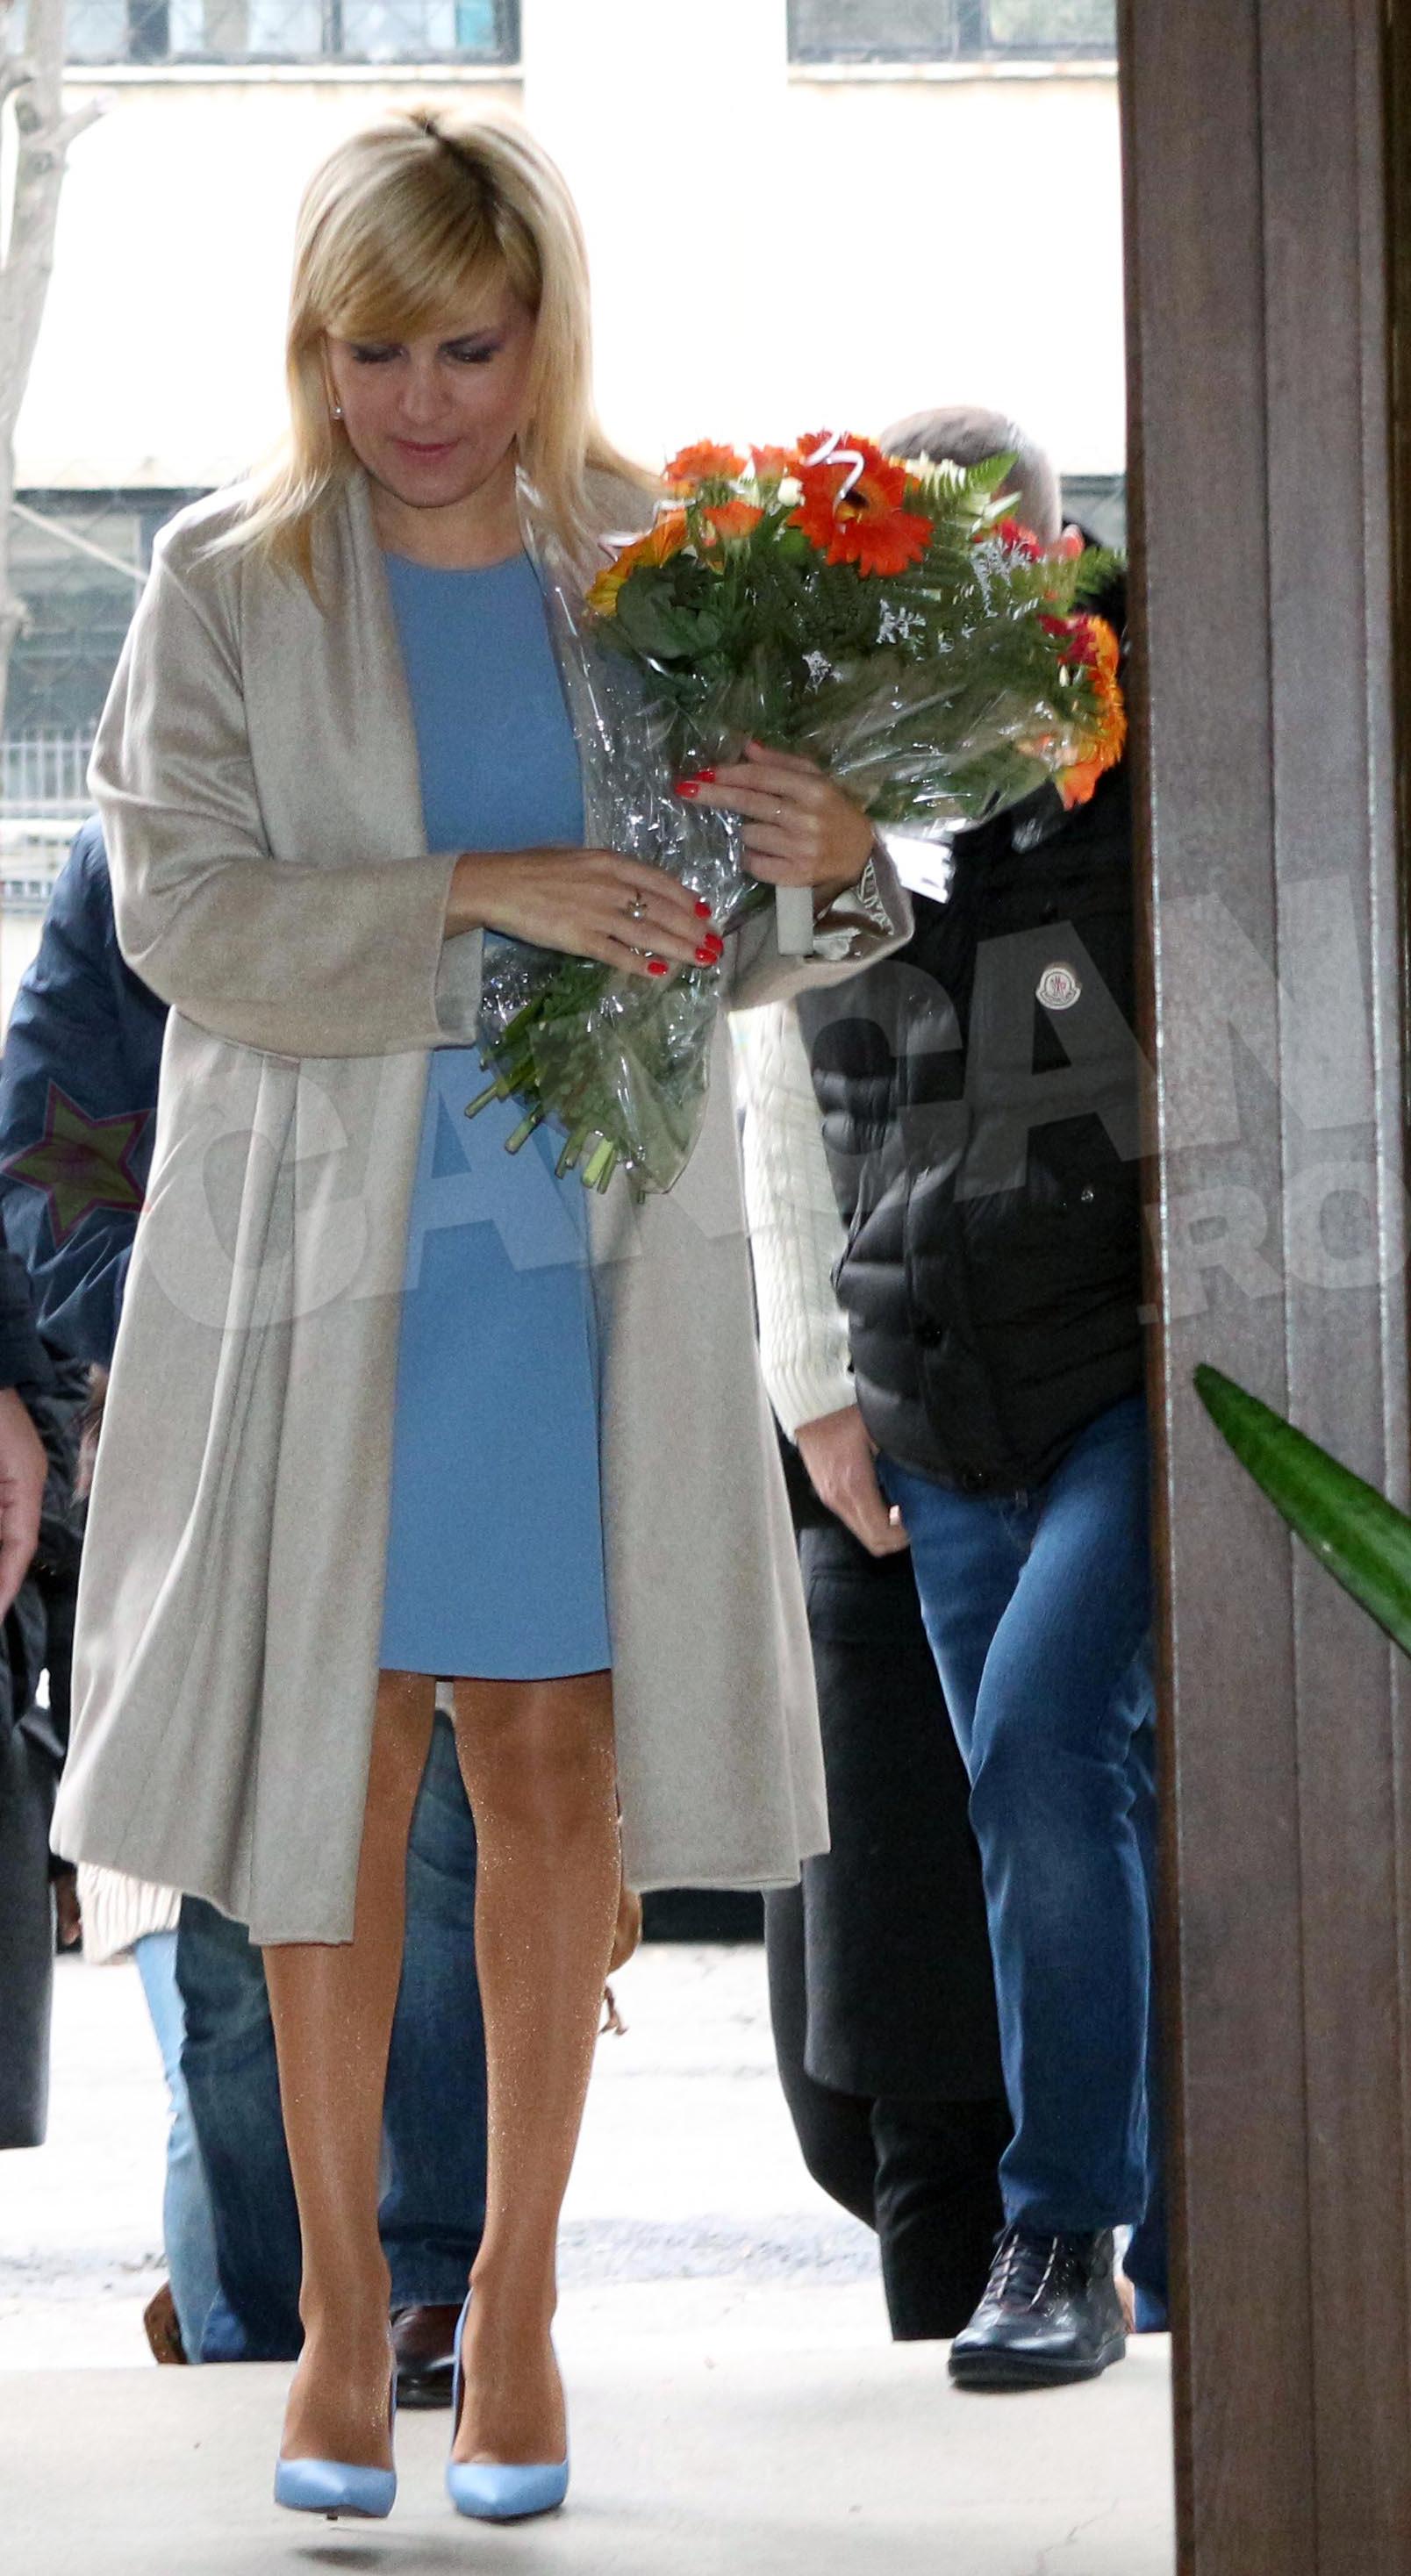 Elena Udrea a ales pentru ziua alegerilor o rochie bleu, asortata cu un trenci gri perlat